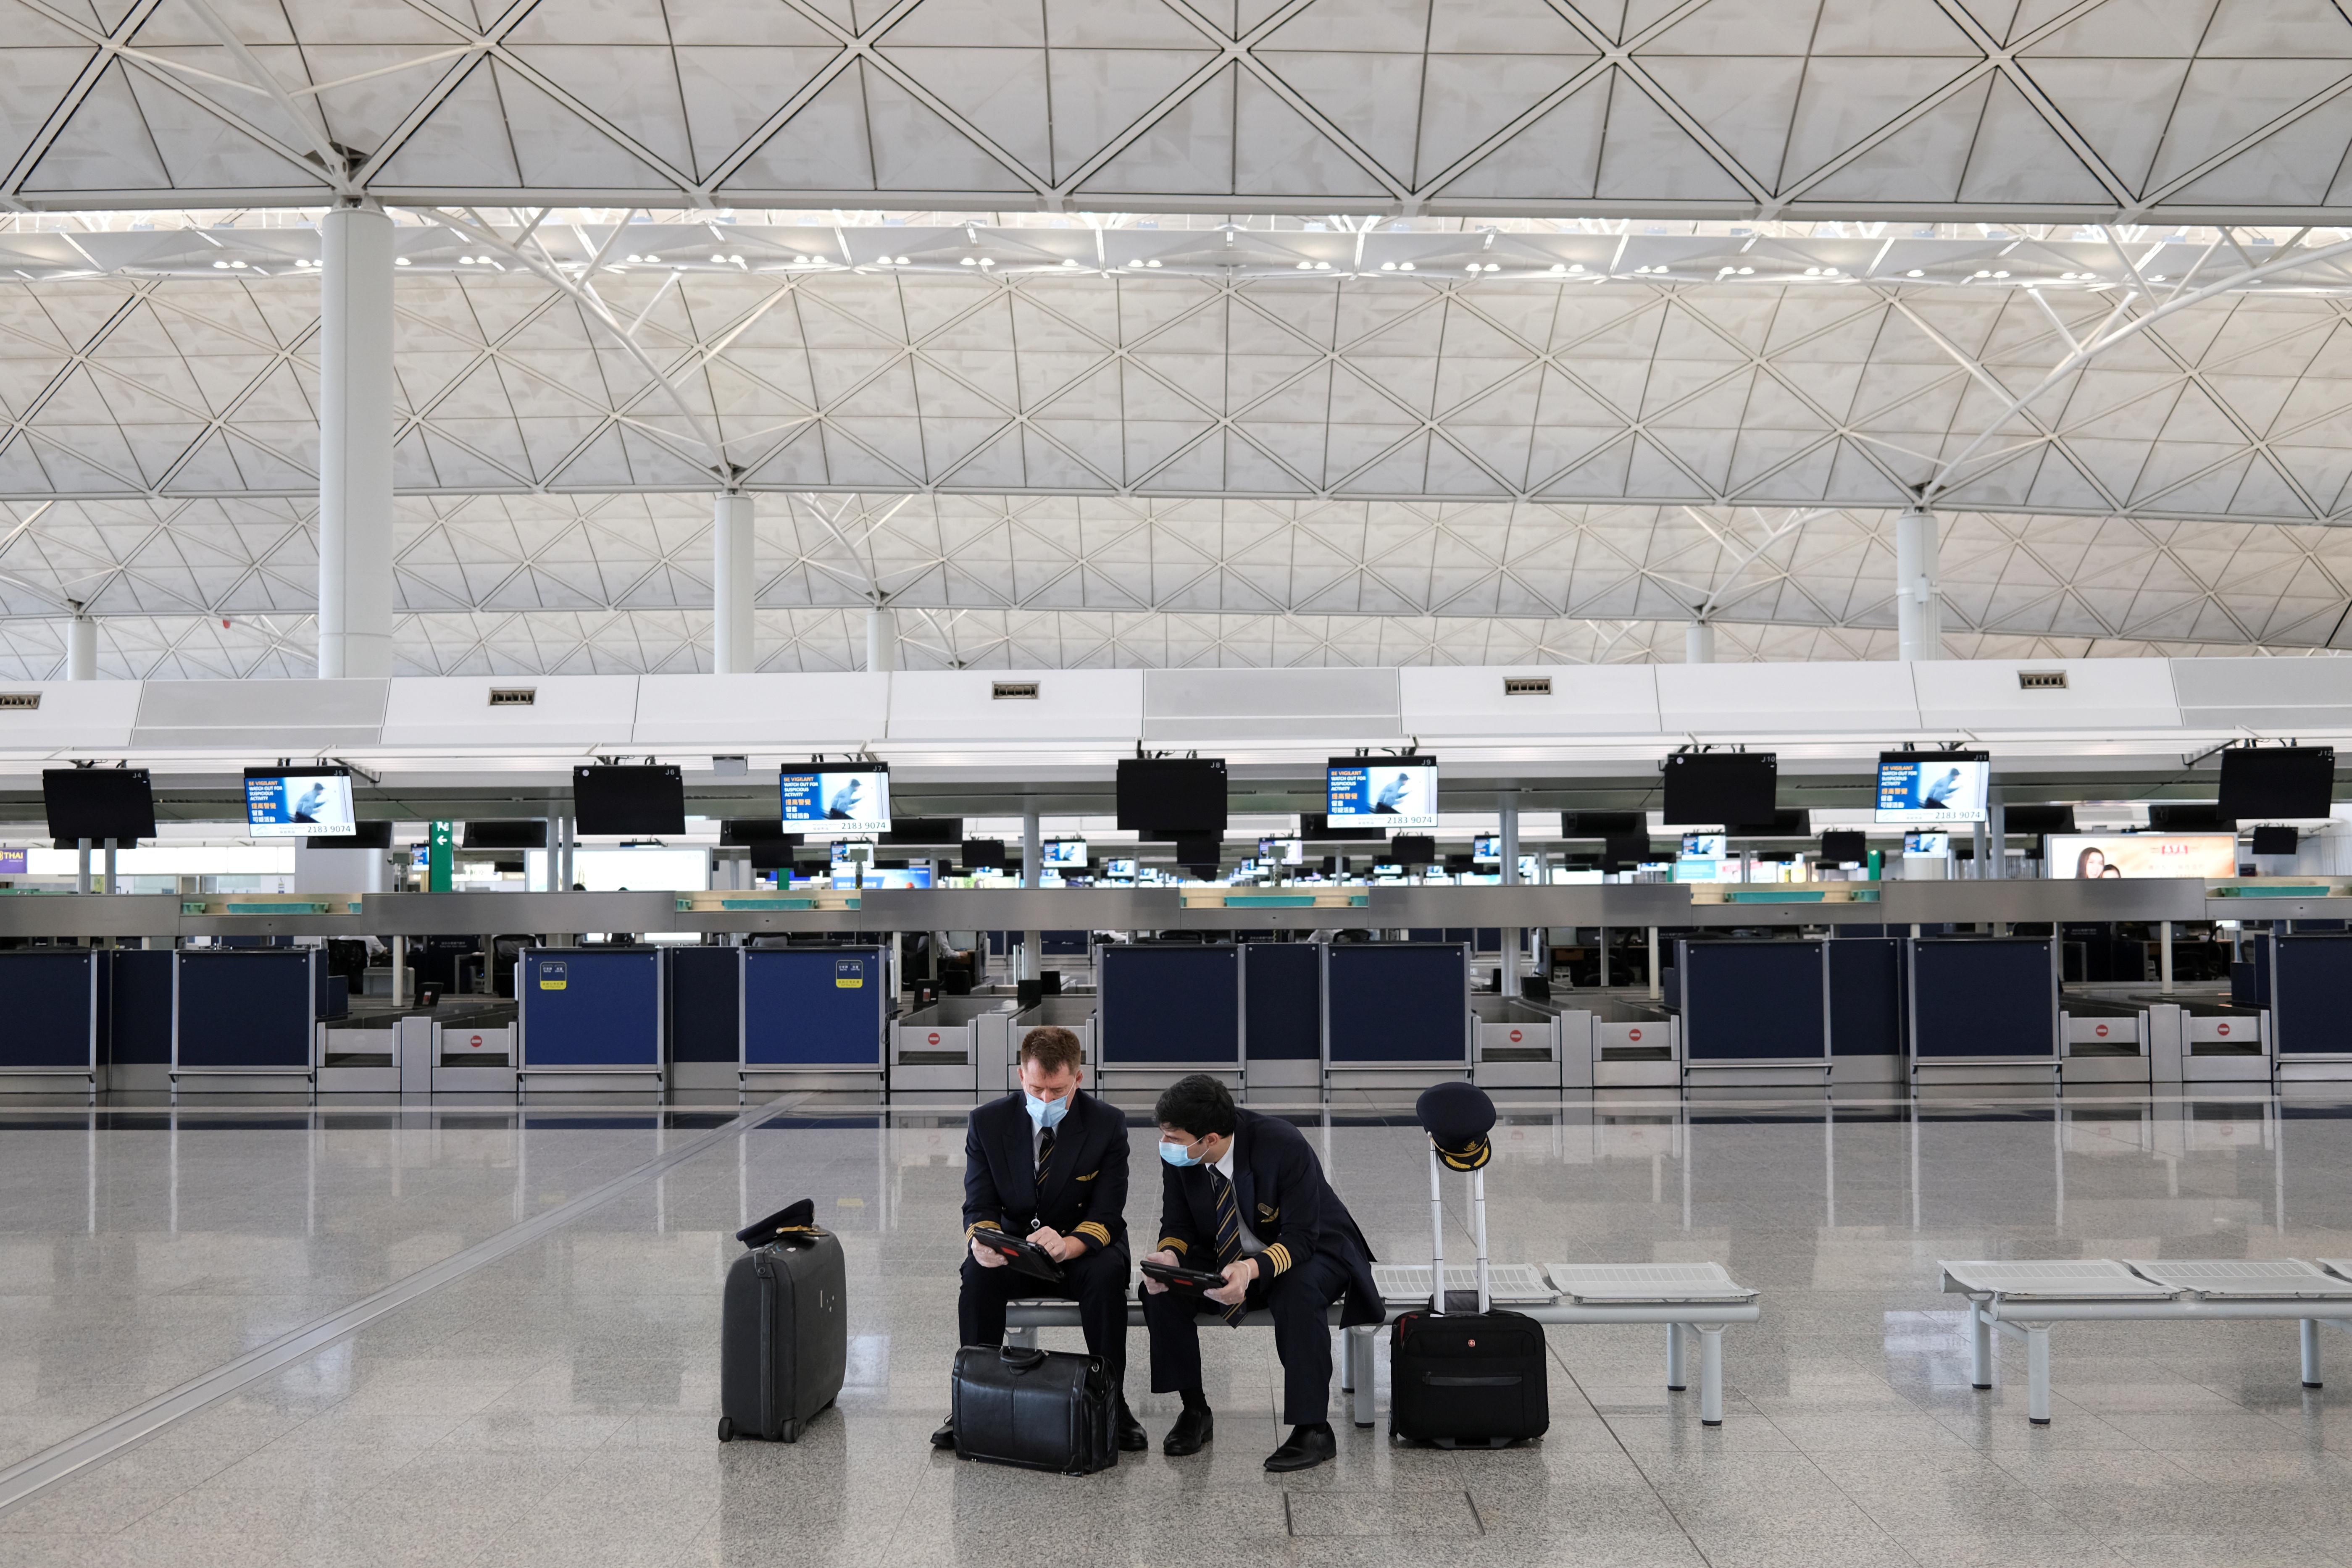 Pilots wearing face masks to avoid the spread of the coronavirus are seen at the Hong Kong International Airport, in Hong Kong, China May 7, 2020.  REUTERS/Tyrone Siu